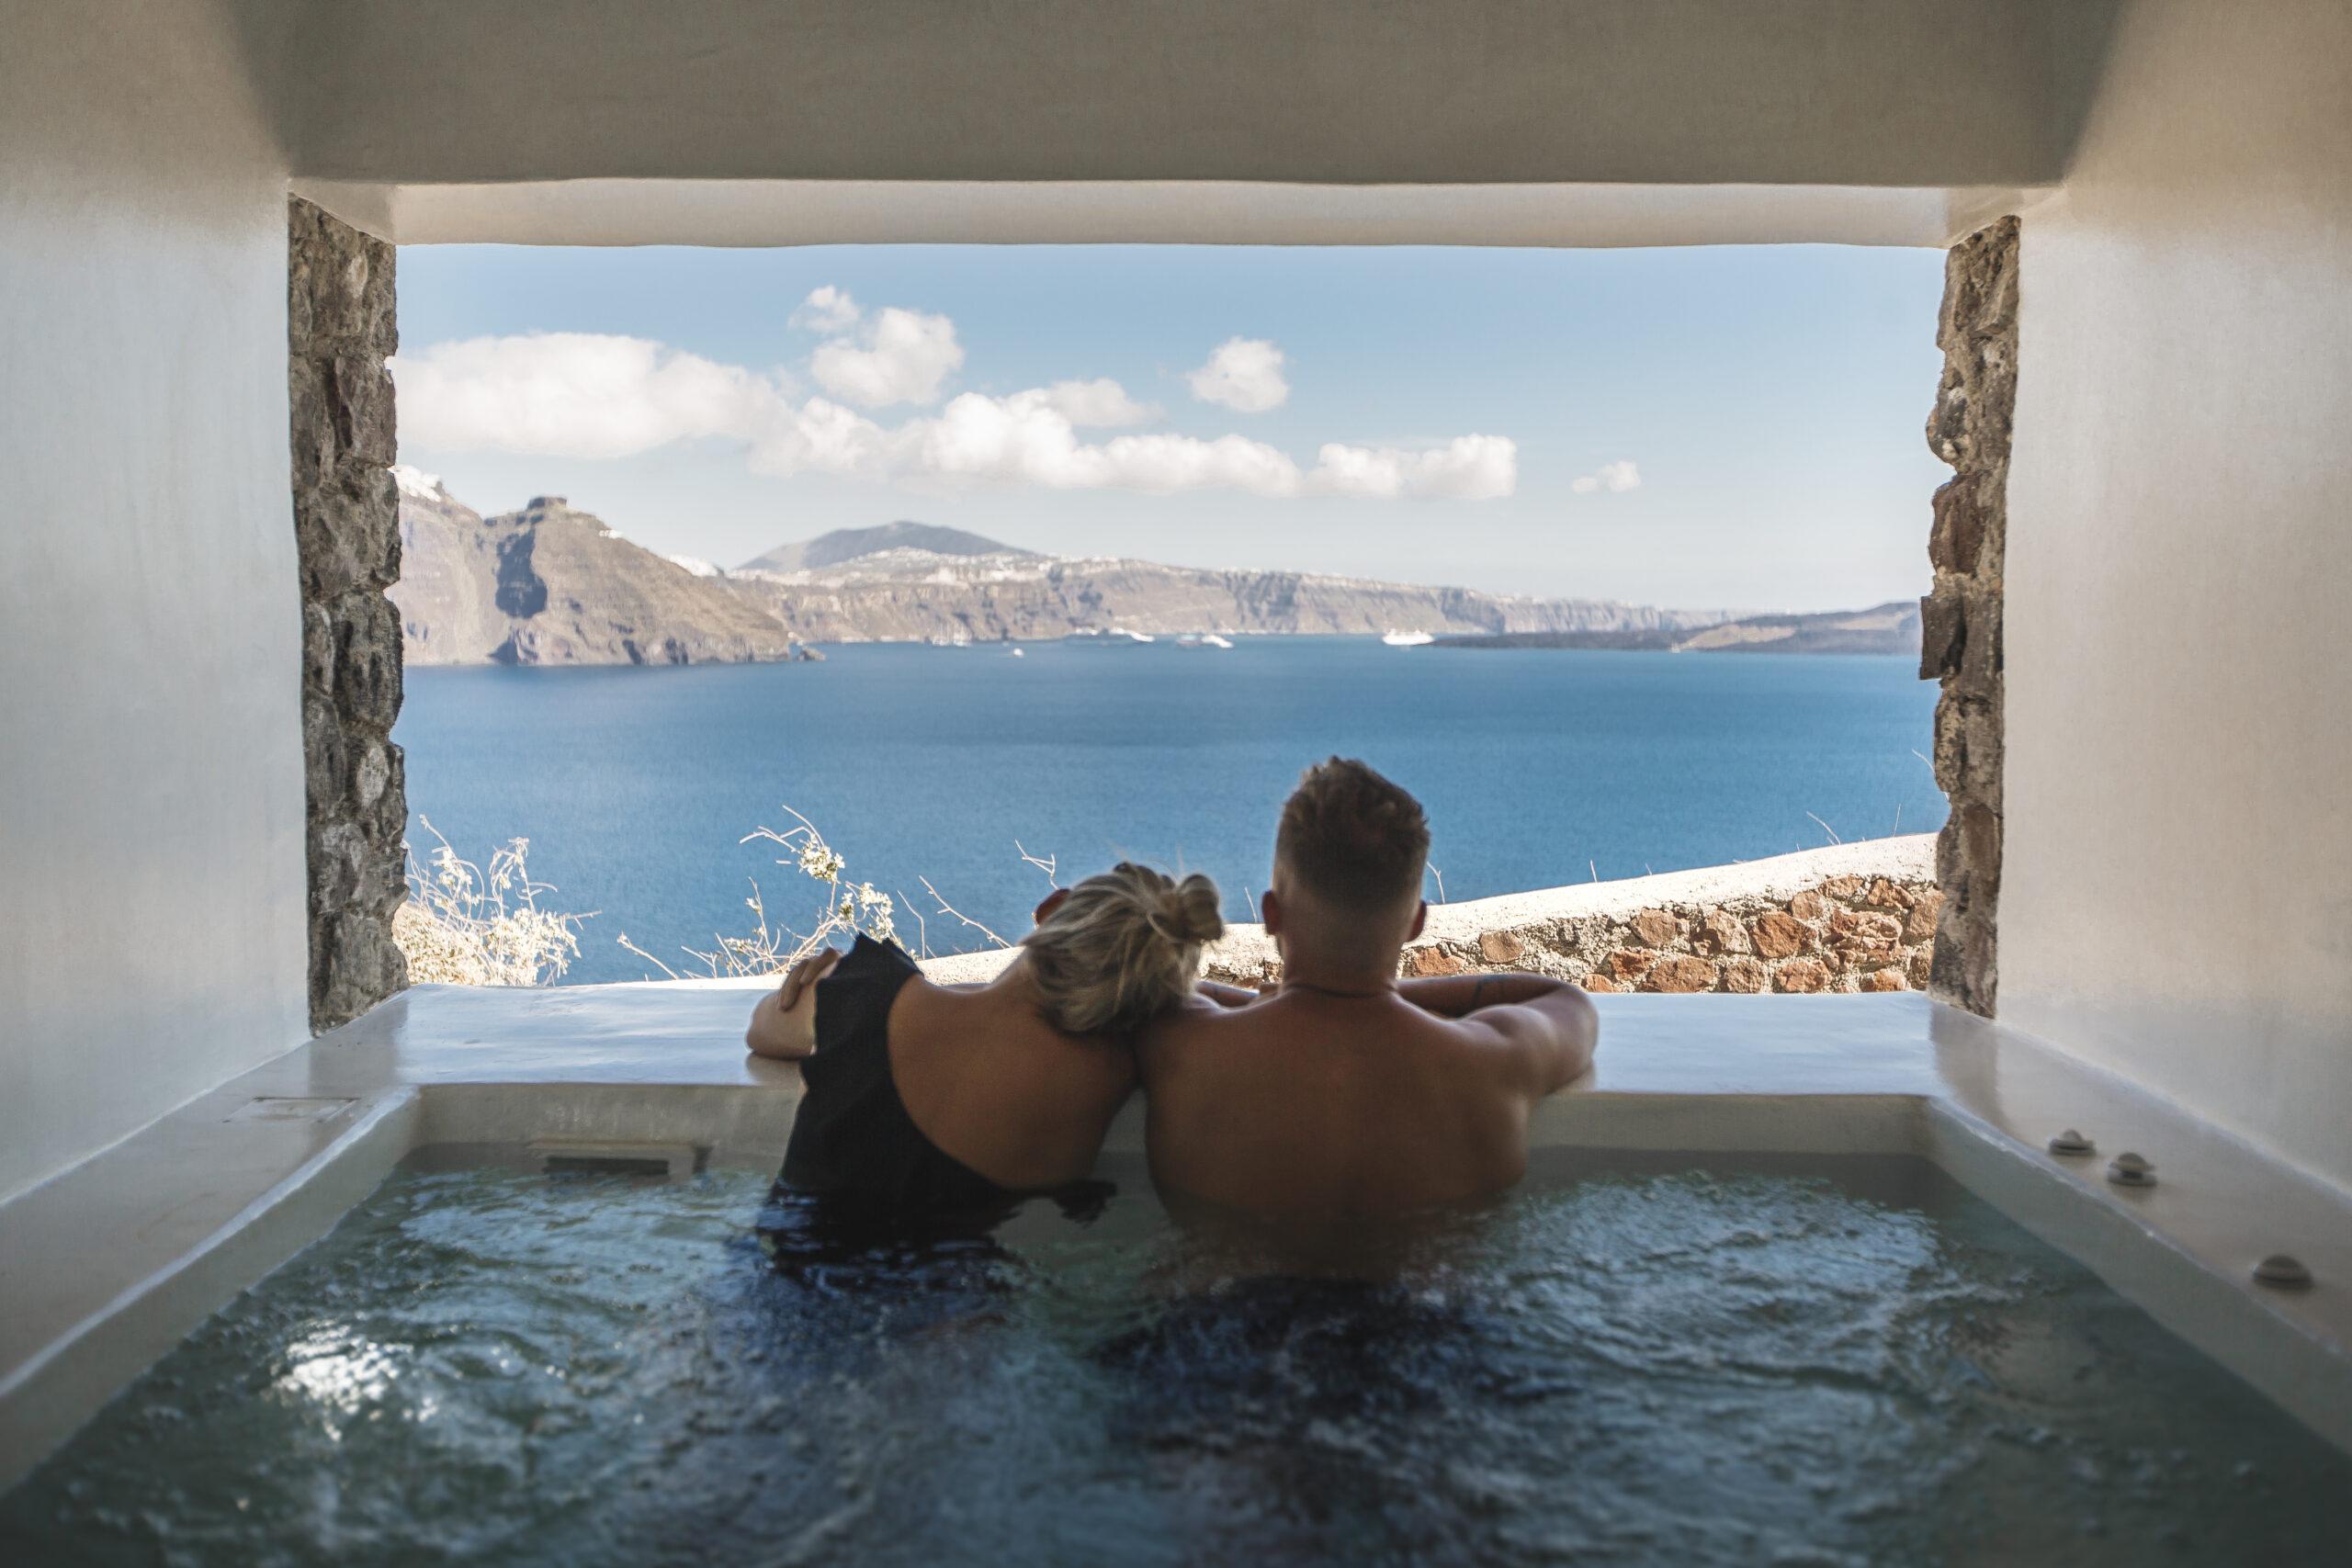 Couple in private jacuzzi enjoy sea view in Santorini